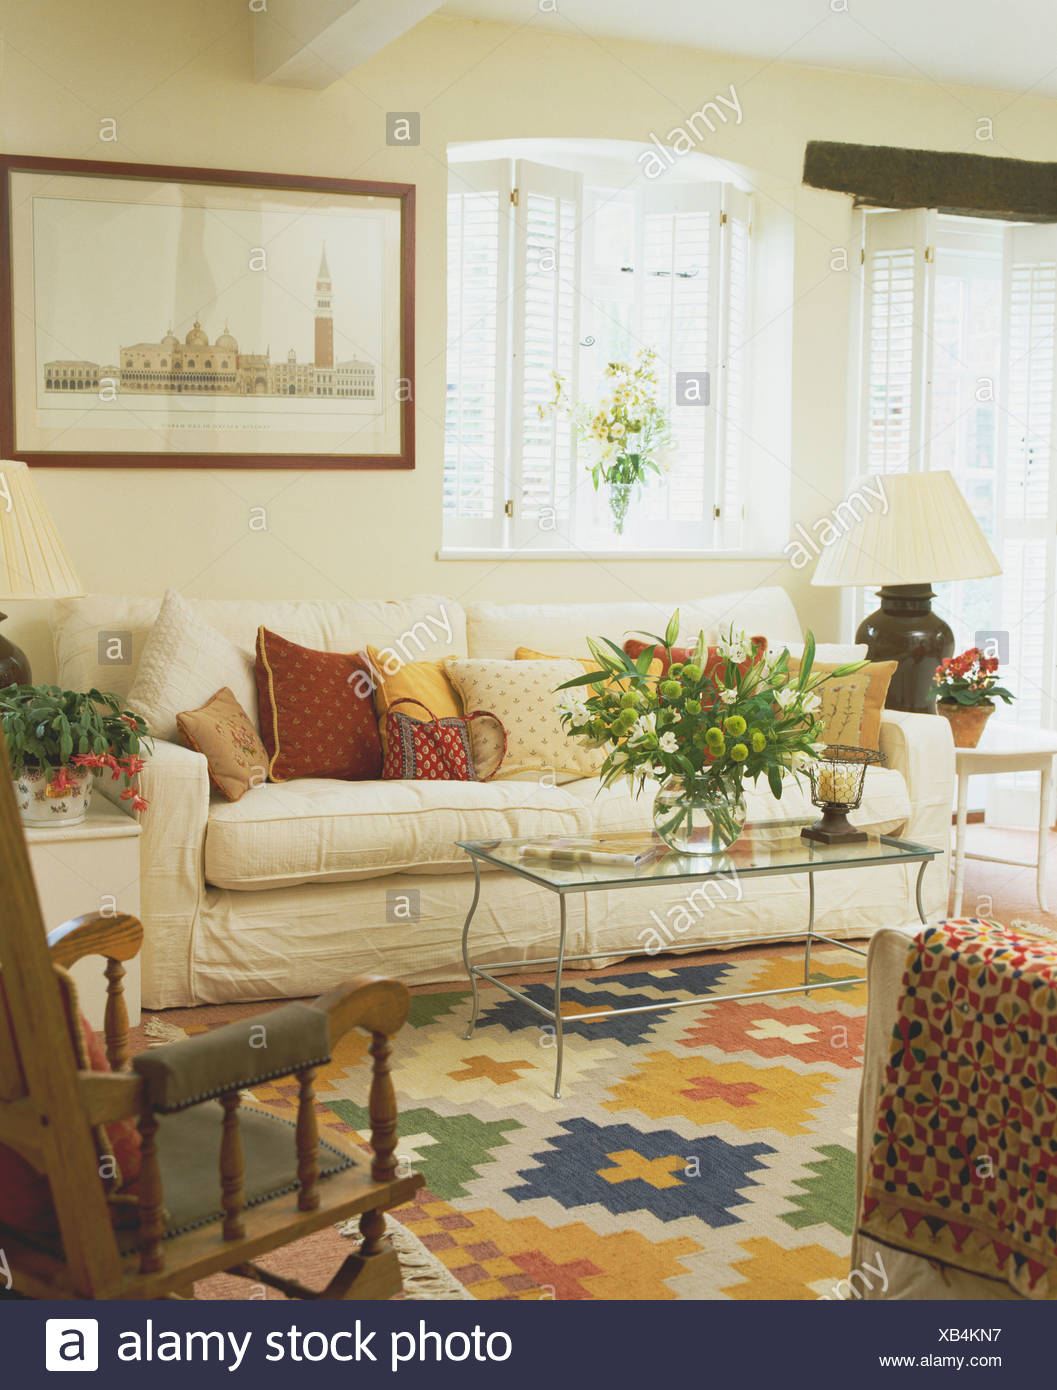 White Plantation Shutters On Window Above Cream Sofa In